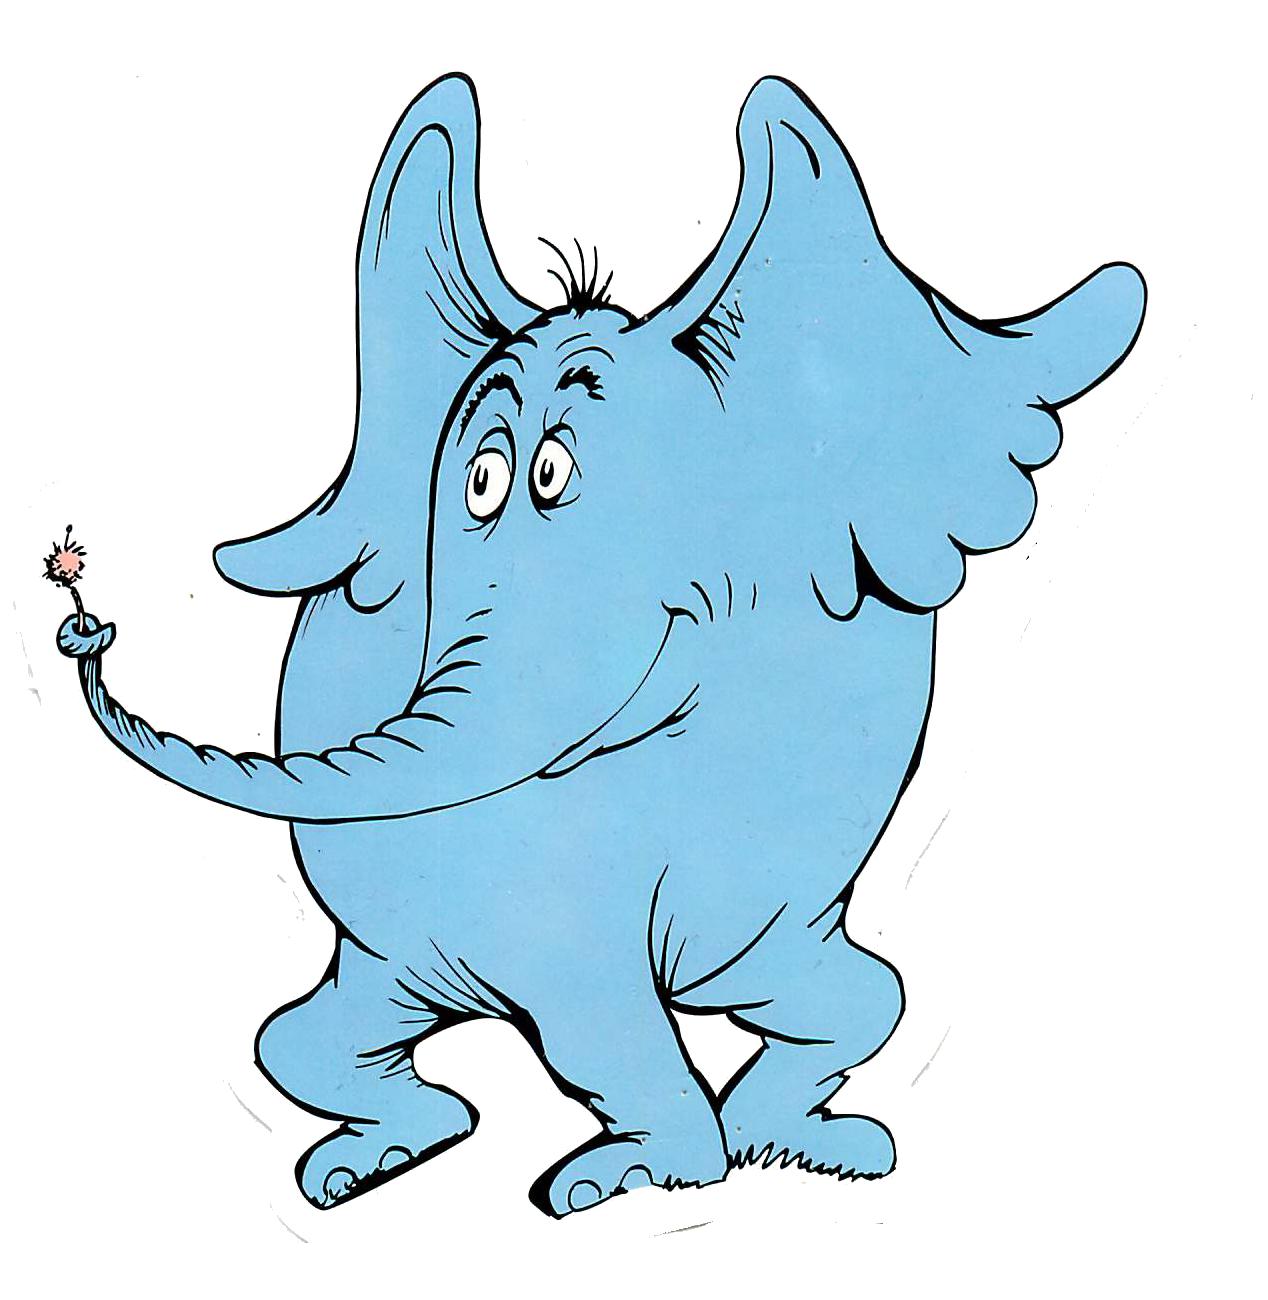 dr seuss clipart dr seuss pinterest bulletin board school rh pinterest com Dr. Seuss Characters Coloring Pages Dr. Seuss Characters Coloring Pages